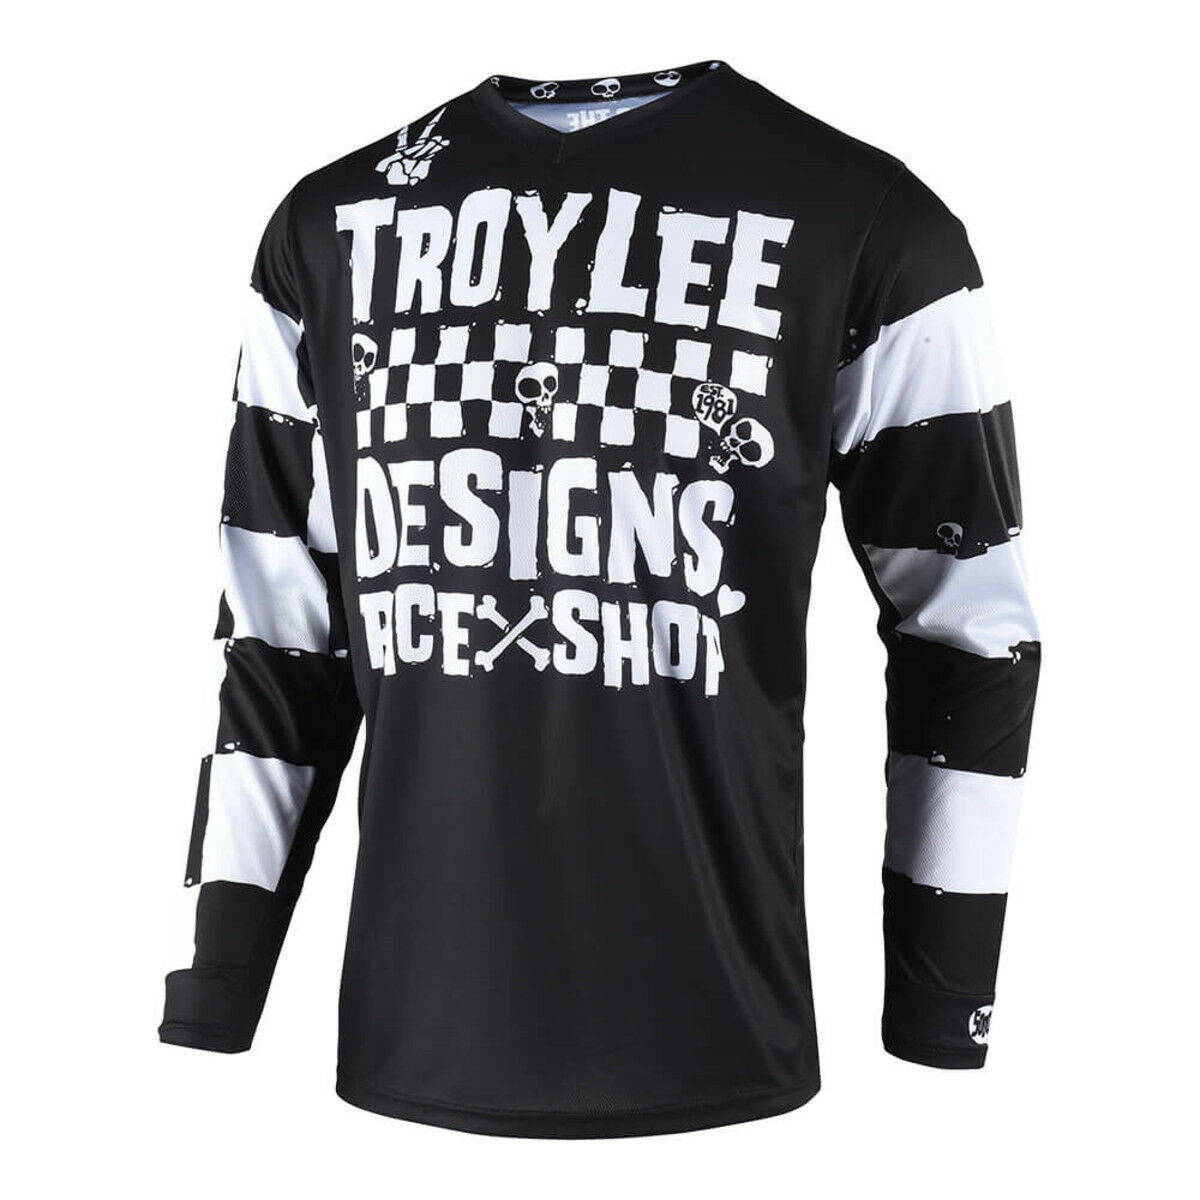 Jerseys Troy Lee Designs Gp Jersey 2019 Moto Black Motocross Mx Dirt Bike Atv All Sizes Sporting Goods